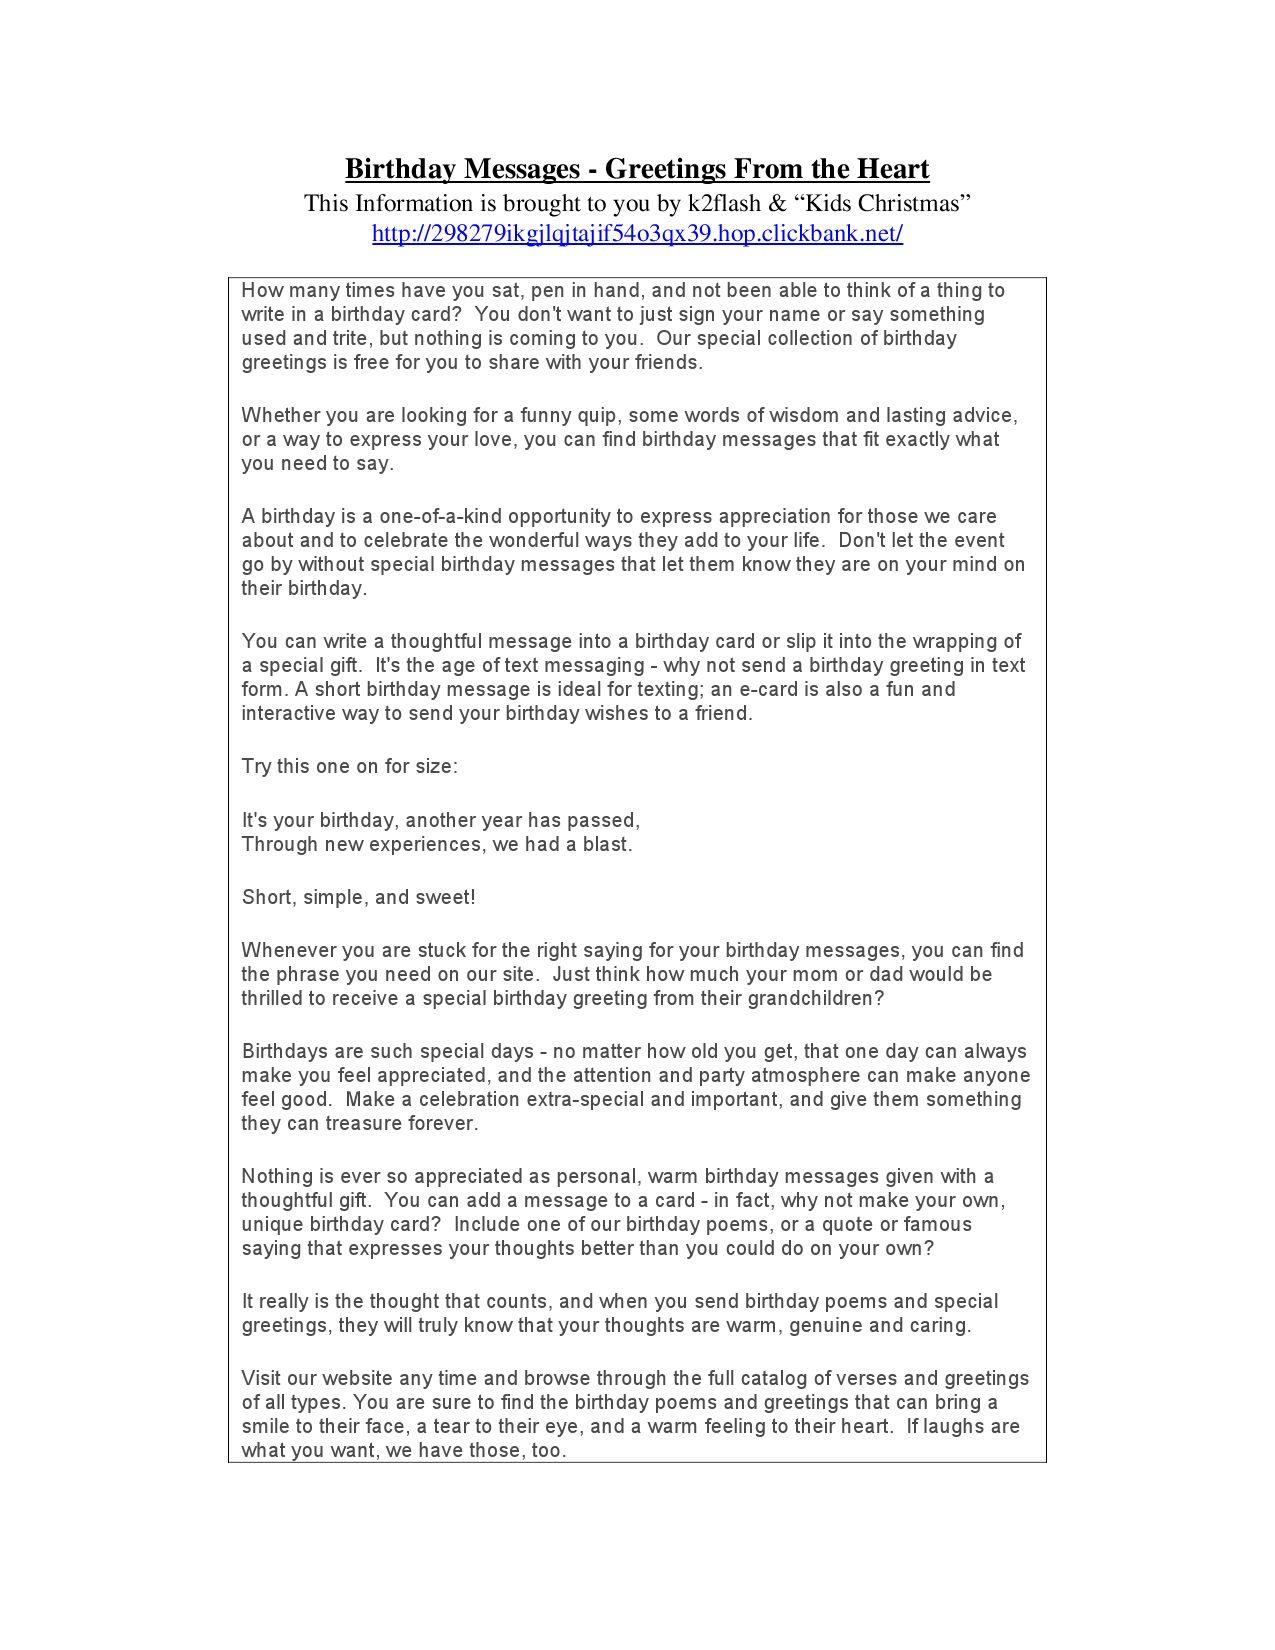 Birthday Messages by Steve Cruz issuu – Creative Birthday Card Messages